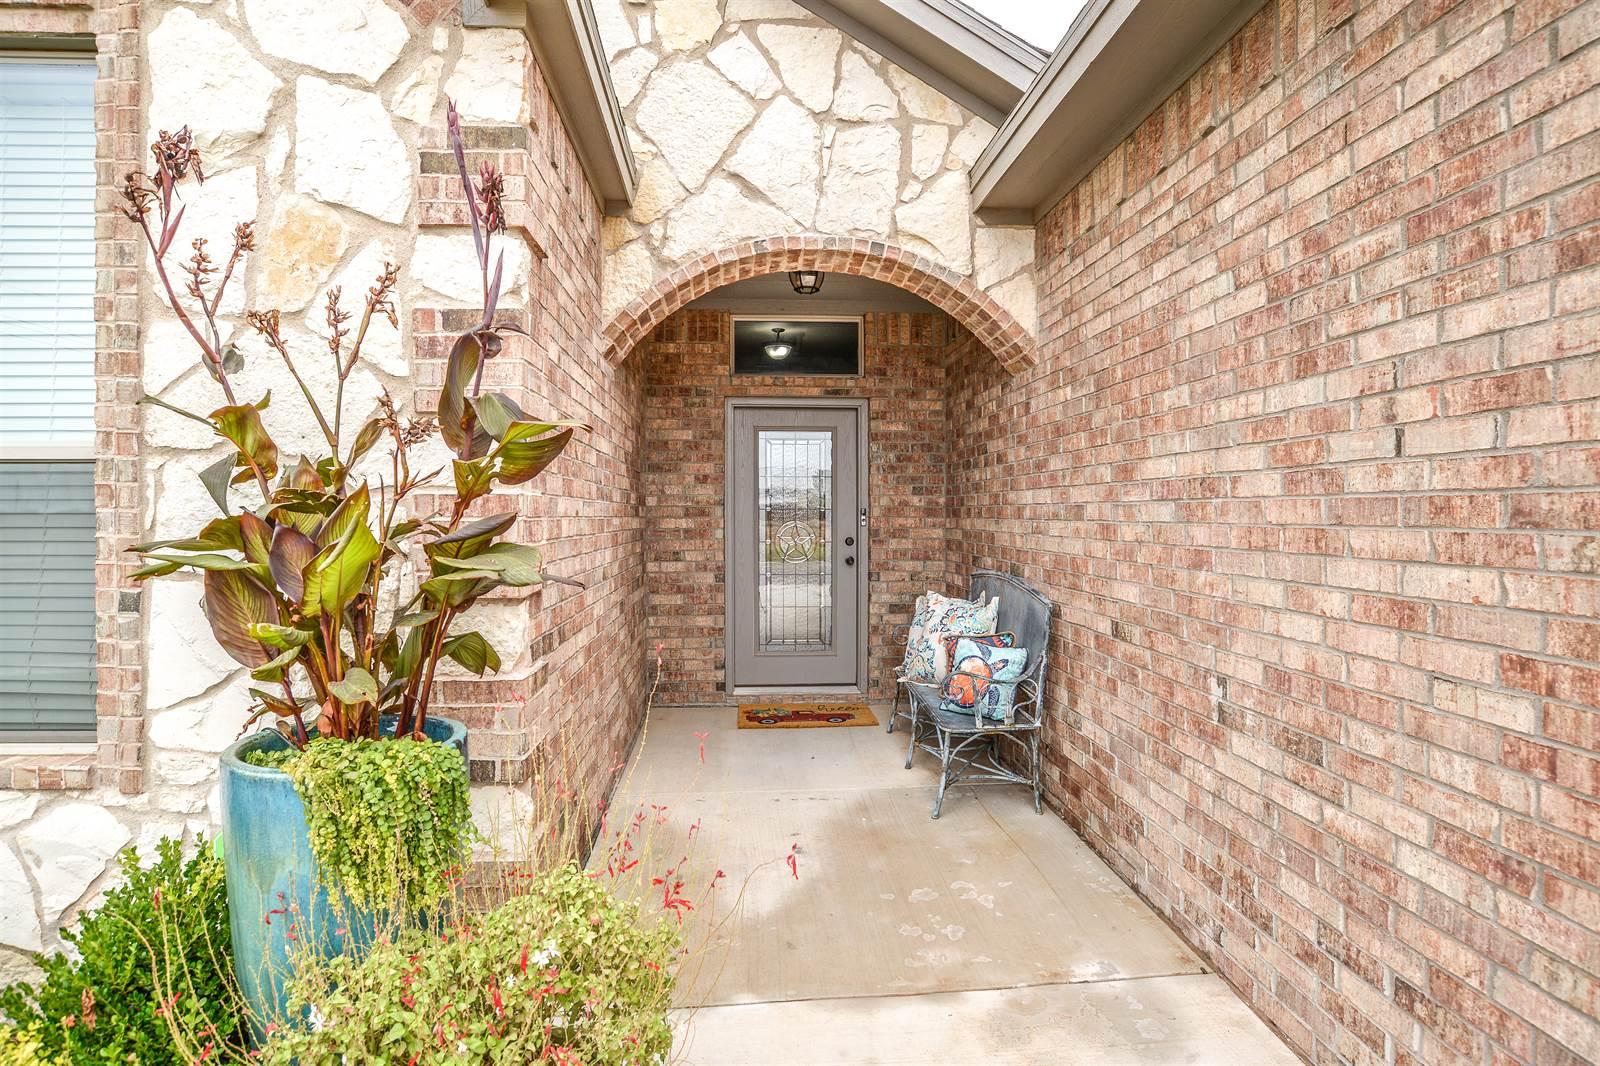 9612 Grover Ave, Lubbock, TX 79424